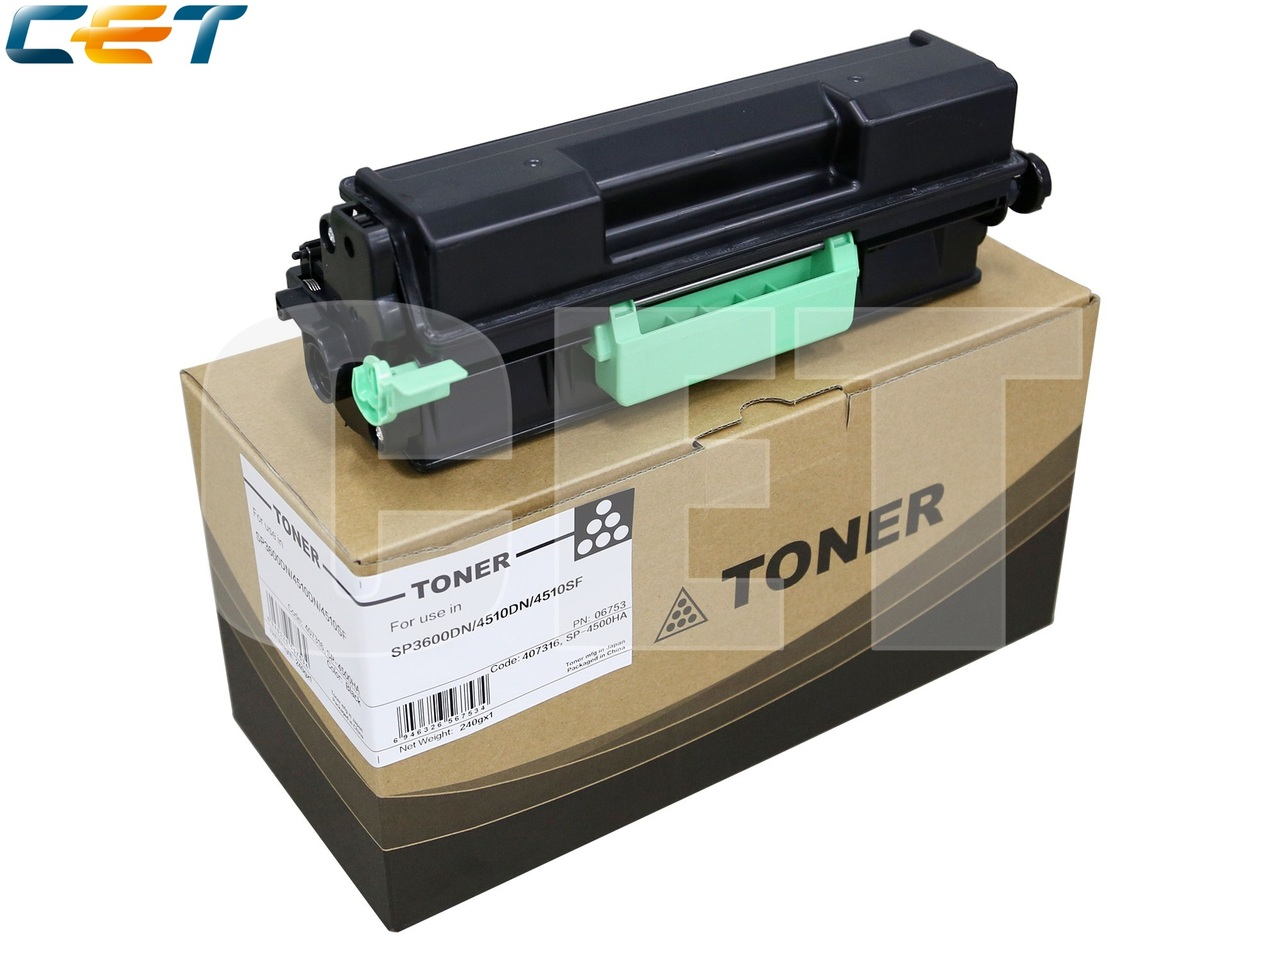 Тонер-картридж 407318 для RICOH SP4510DN/SP4510SF(CET), 240г, 12000 стр., CET6753